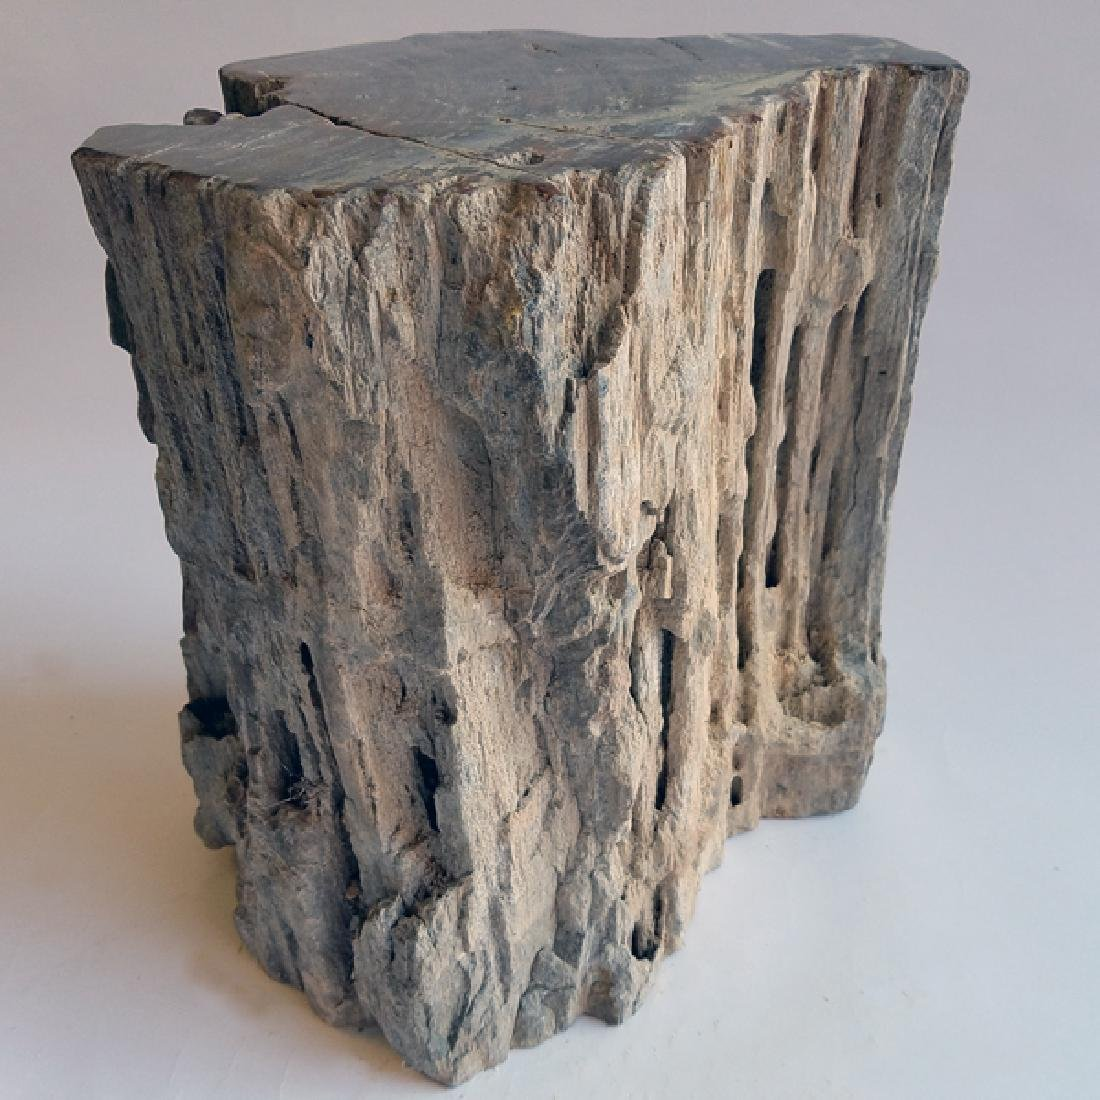 Petrified Wood Stump SCARCE HUGE 240Kg Natural Bark